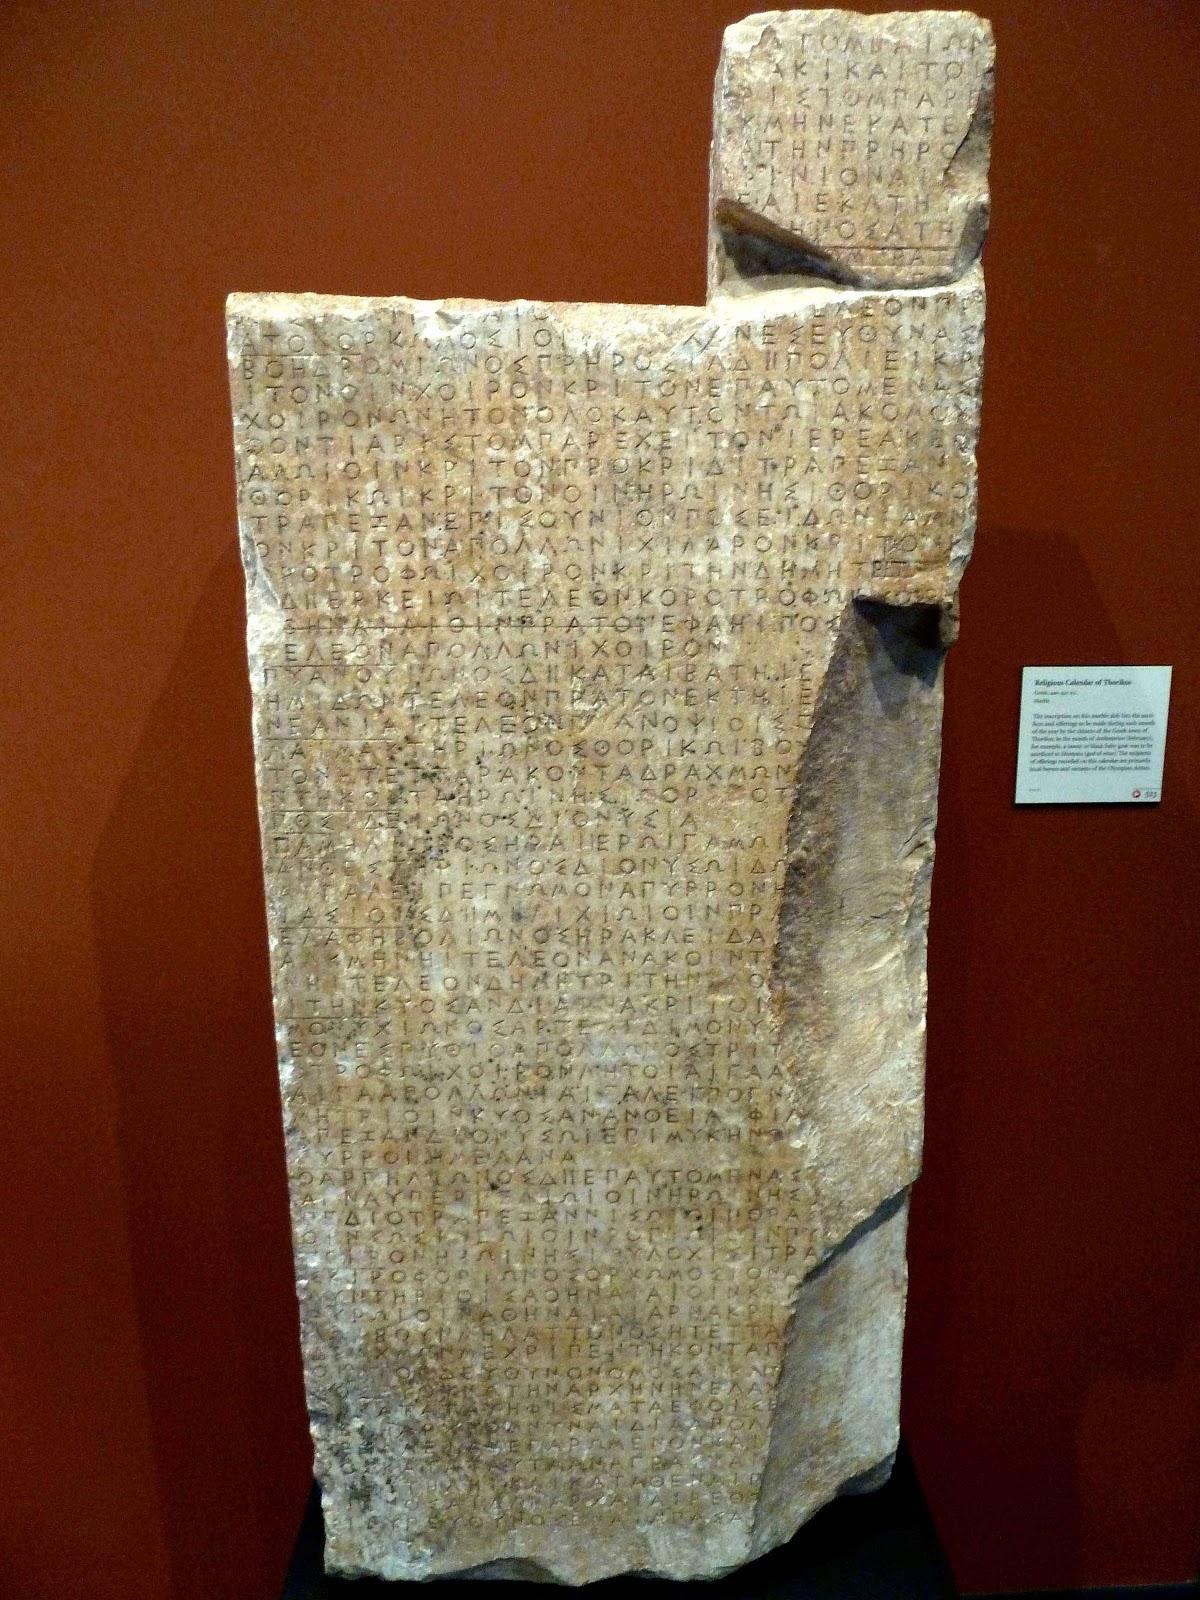 thorikos stele getty Το Ελληνικό Κράτος και οι Επιστροφές Κλεμμένων Αρχαιοτήτων